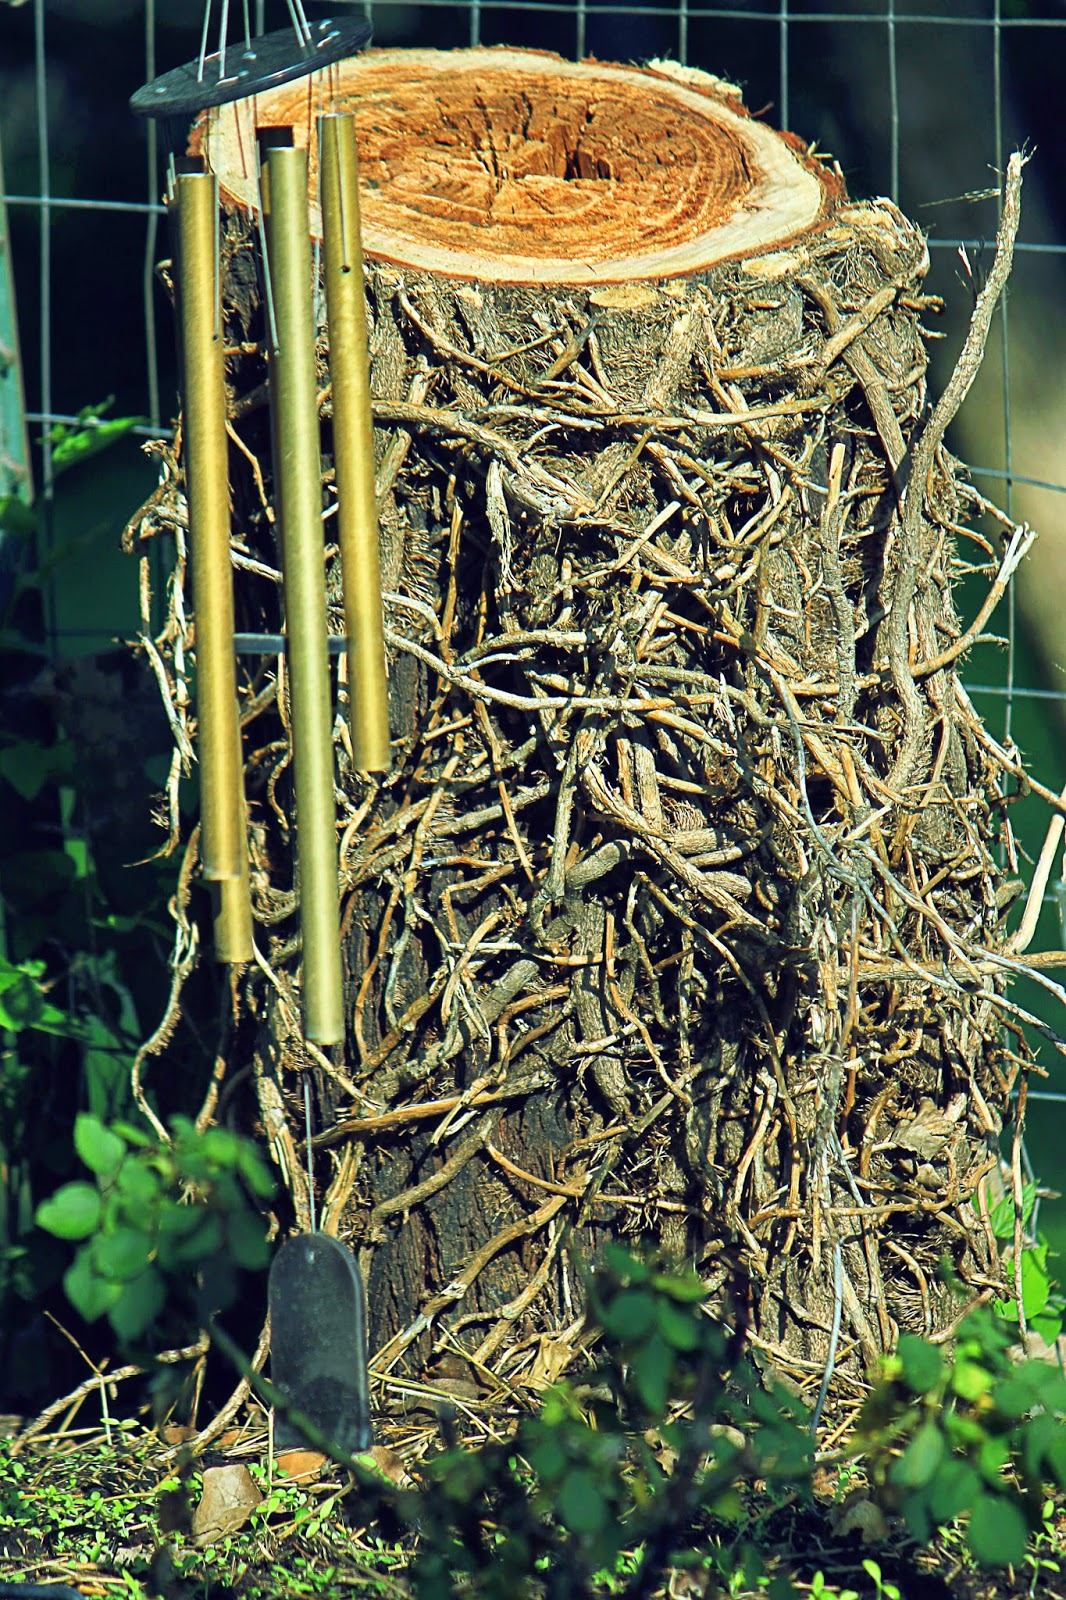 tree stump entanglement